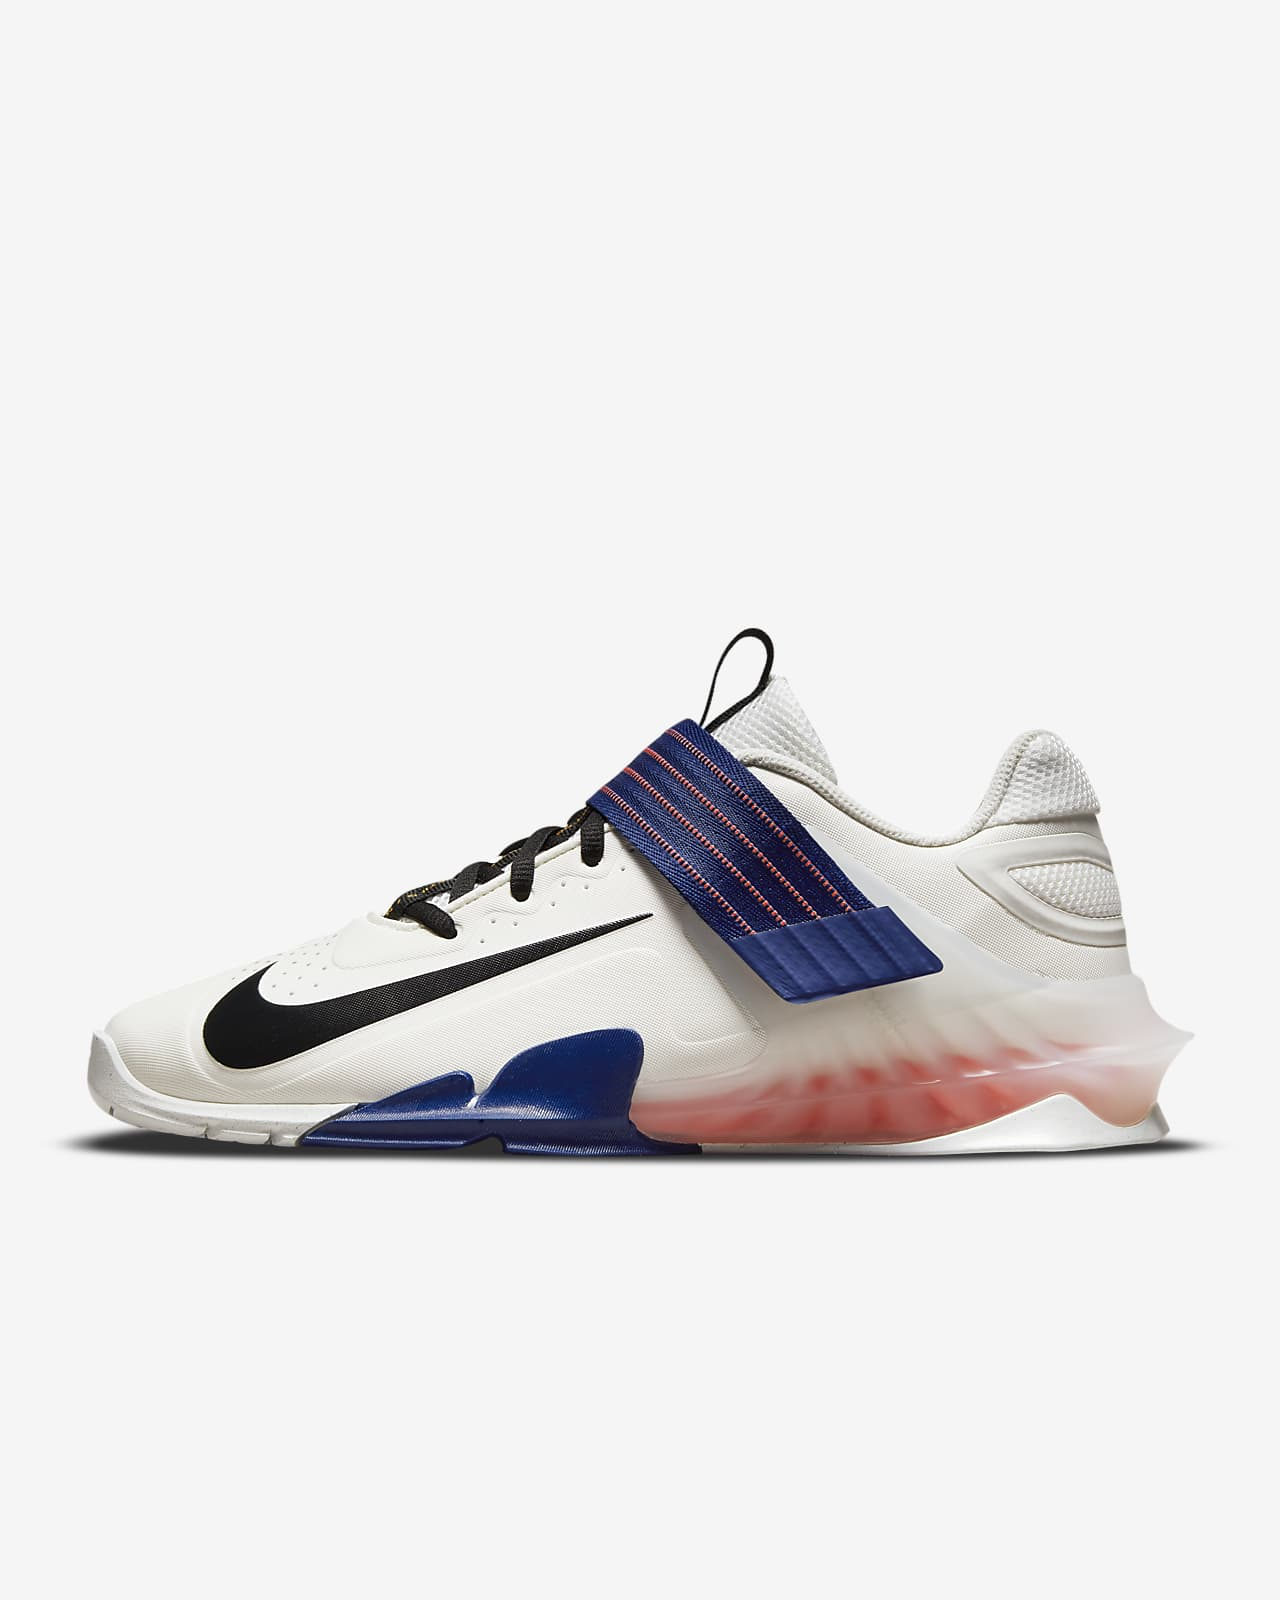 Chaussure de renforcement musculaire Nike Savaleos